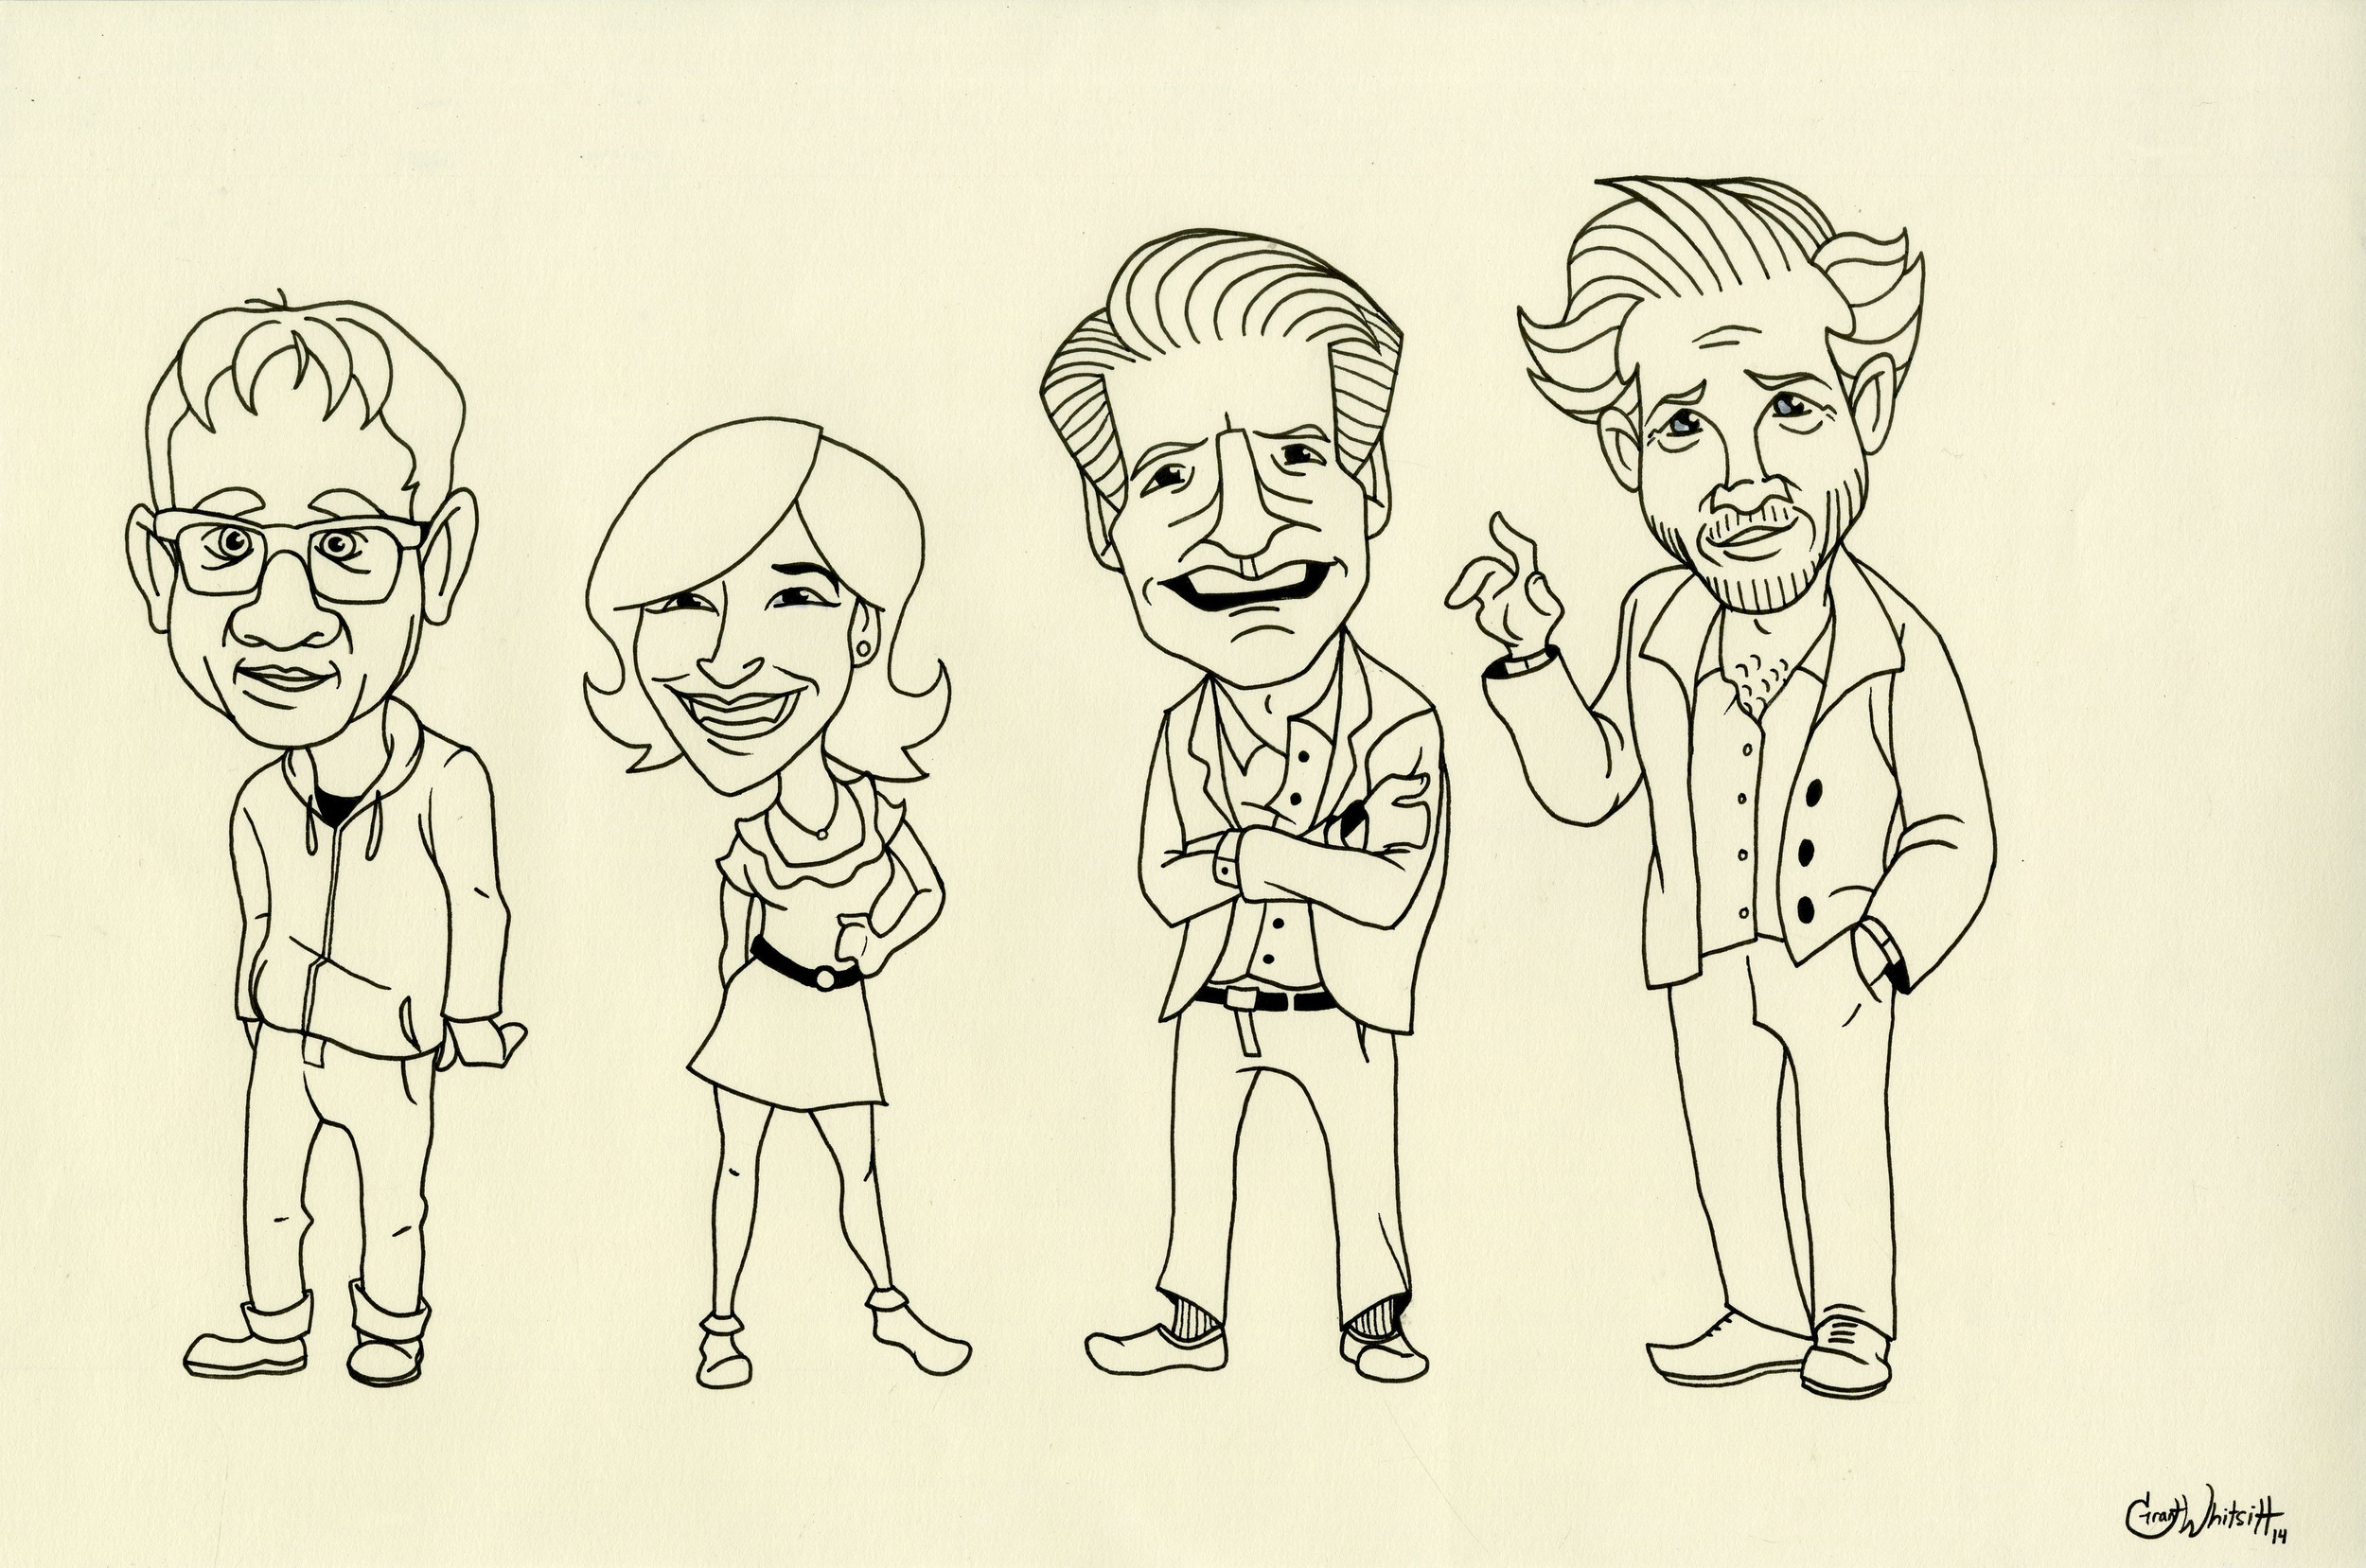 Portlandia Animated Cast Concept - Linework